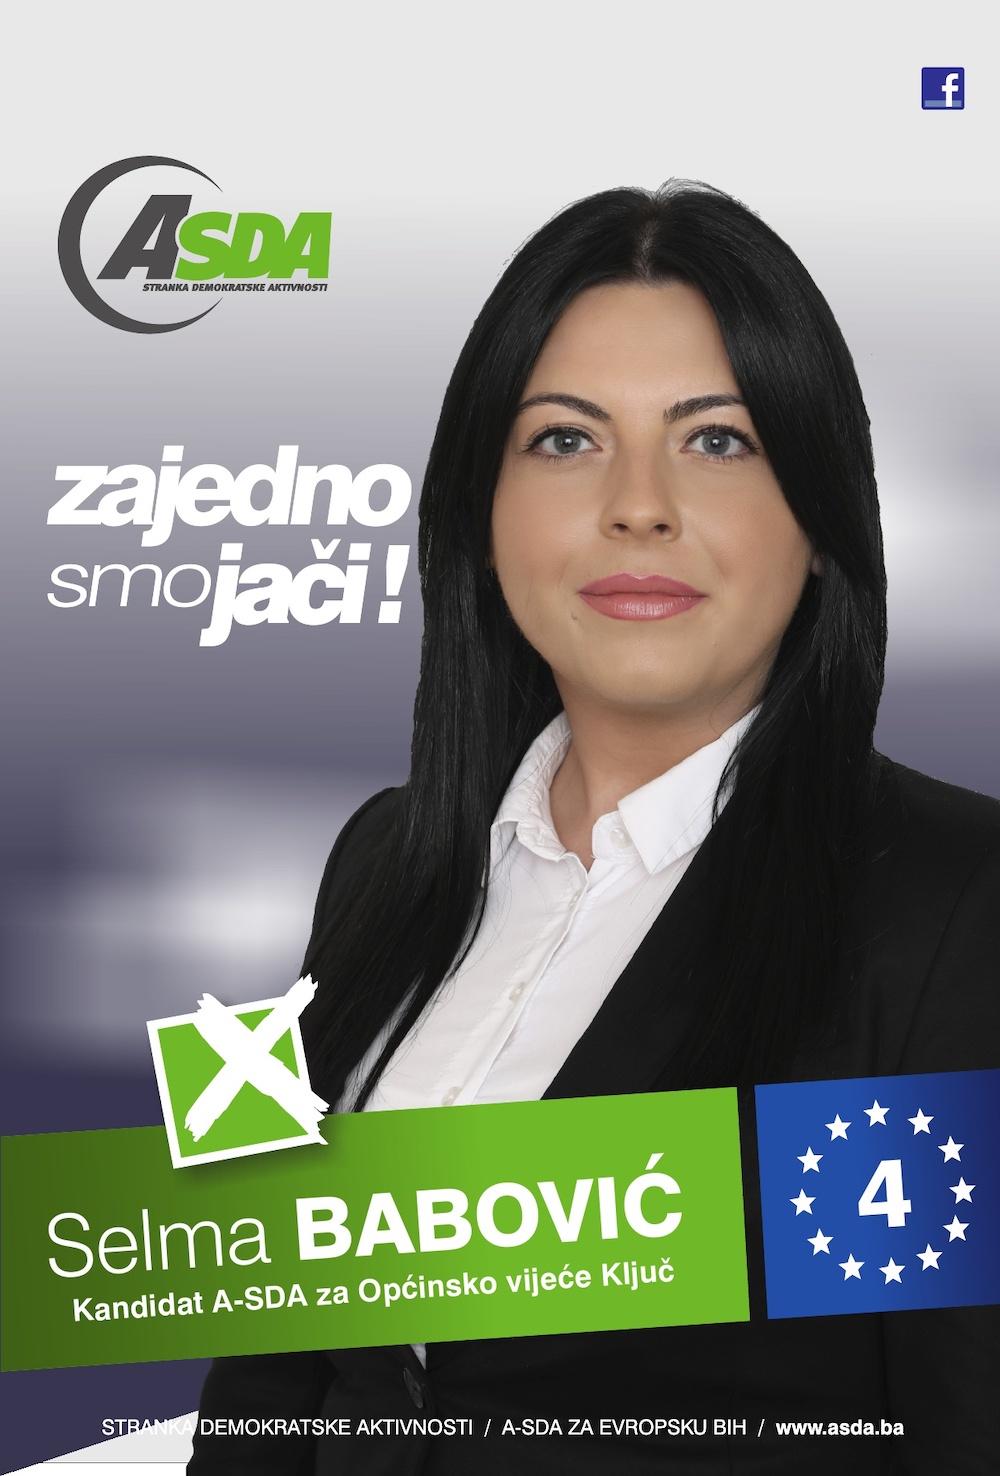 Selma Babović